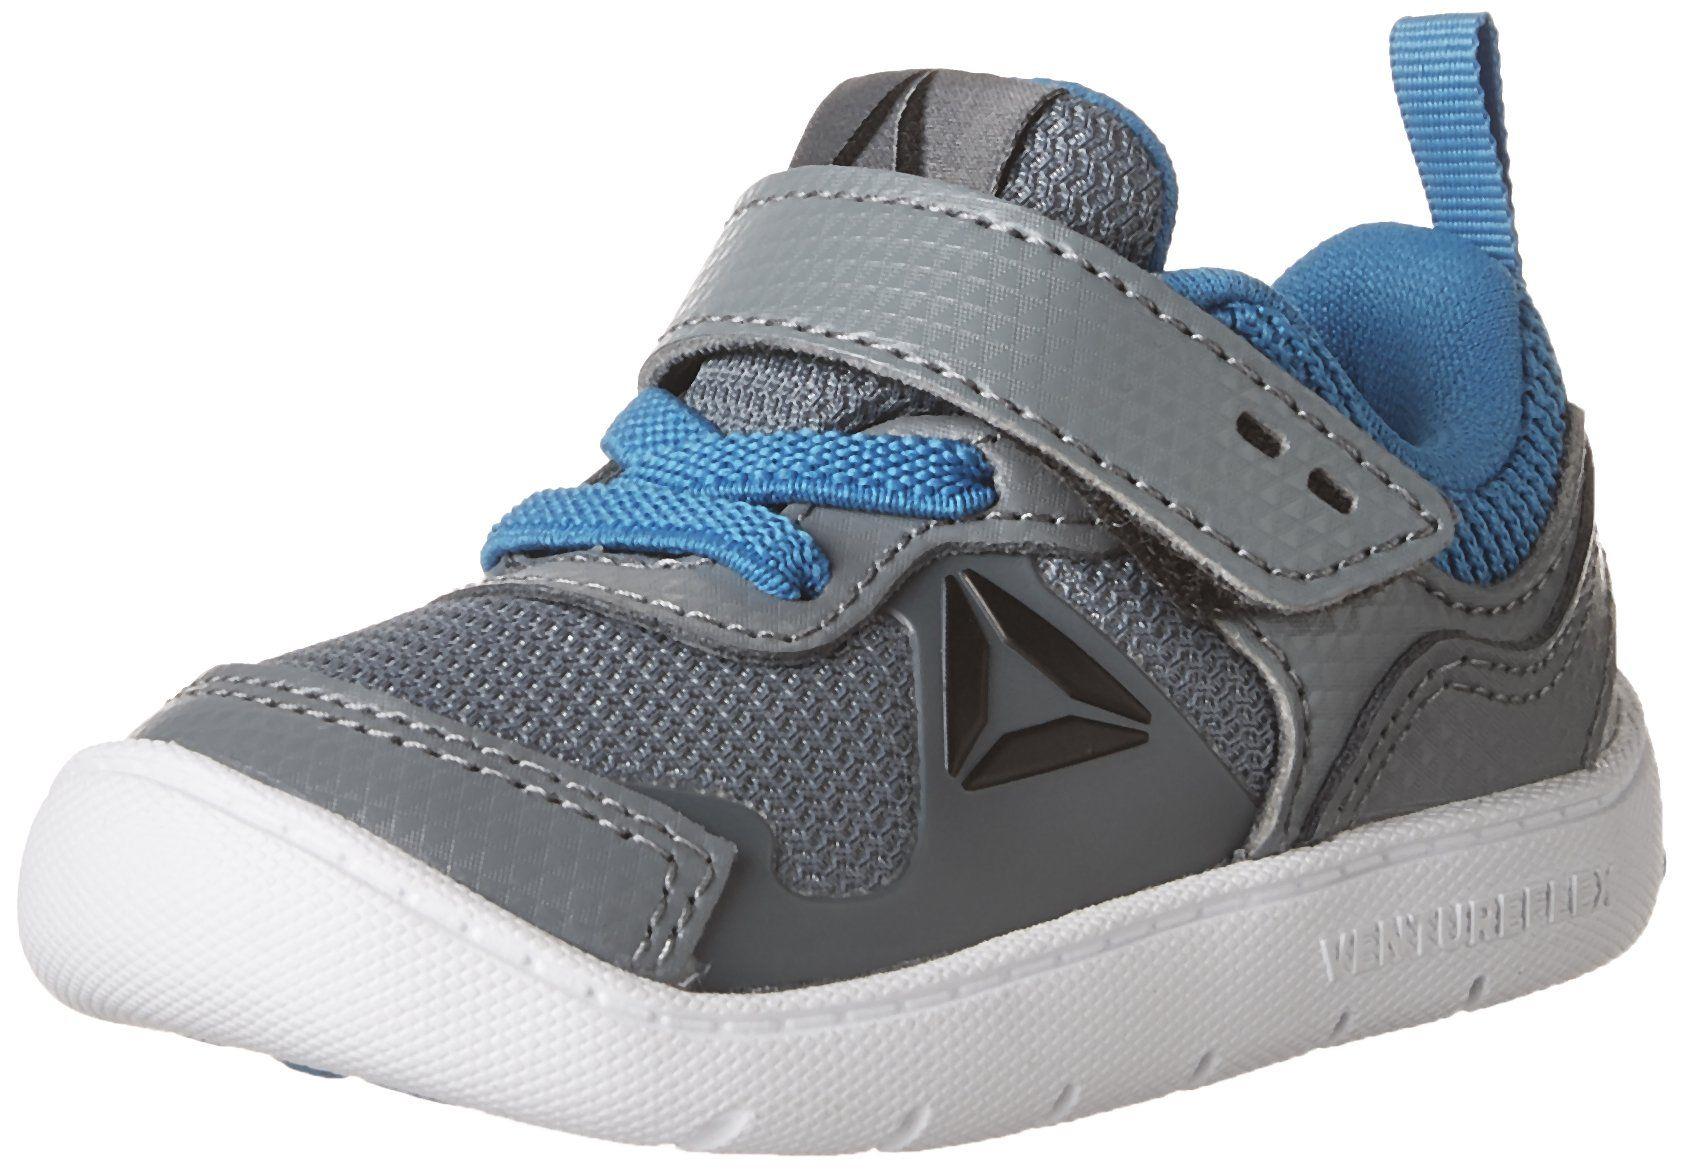 Reebok Baby Ventureflex Stride 5.0 Sneaker 5f500c098